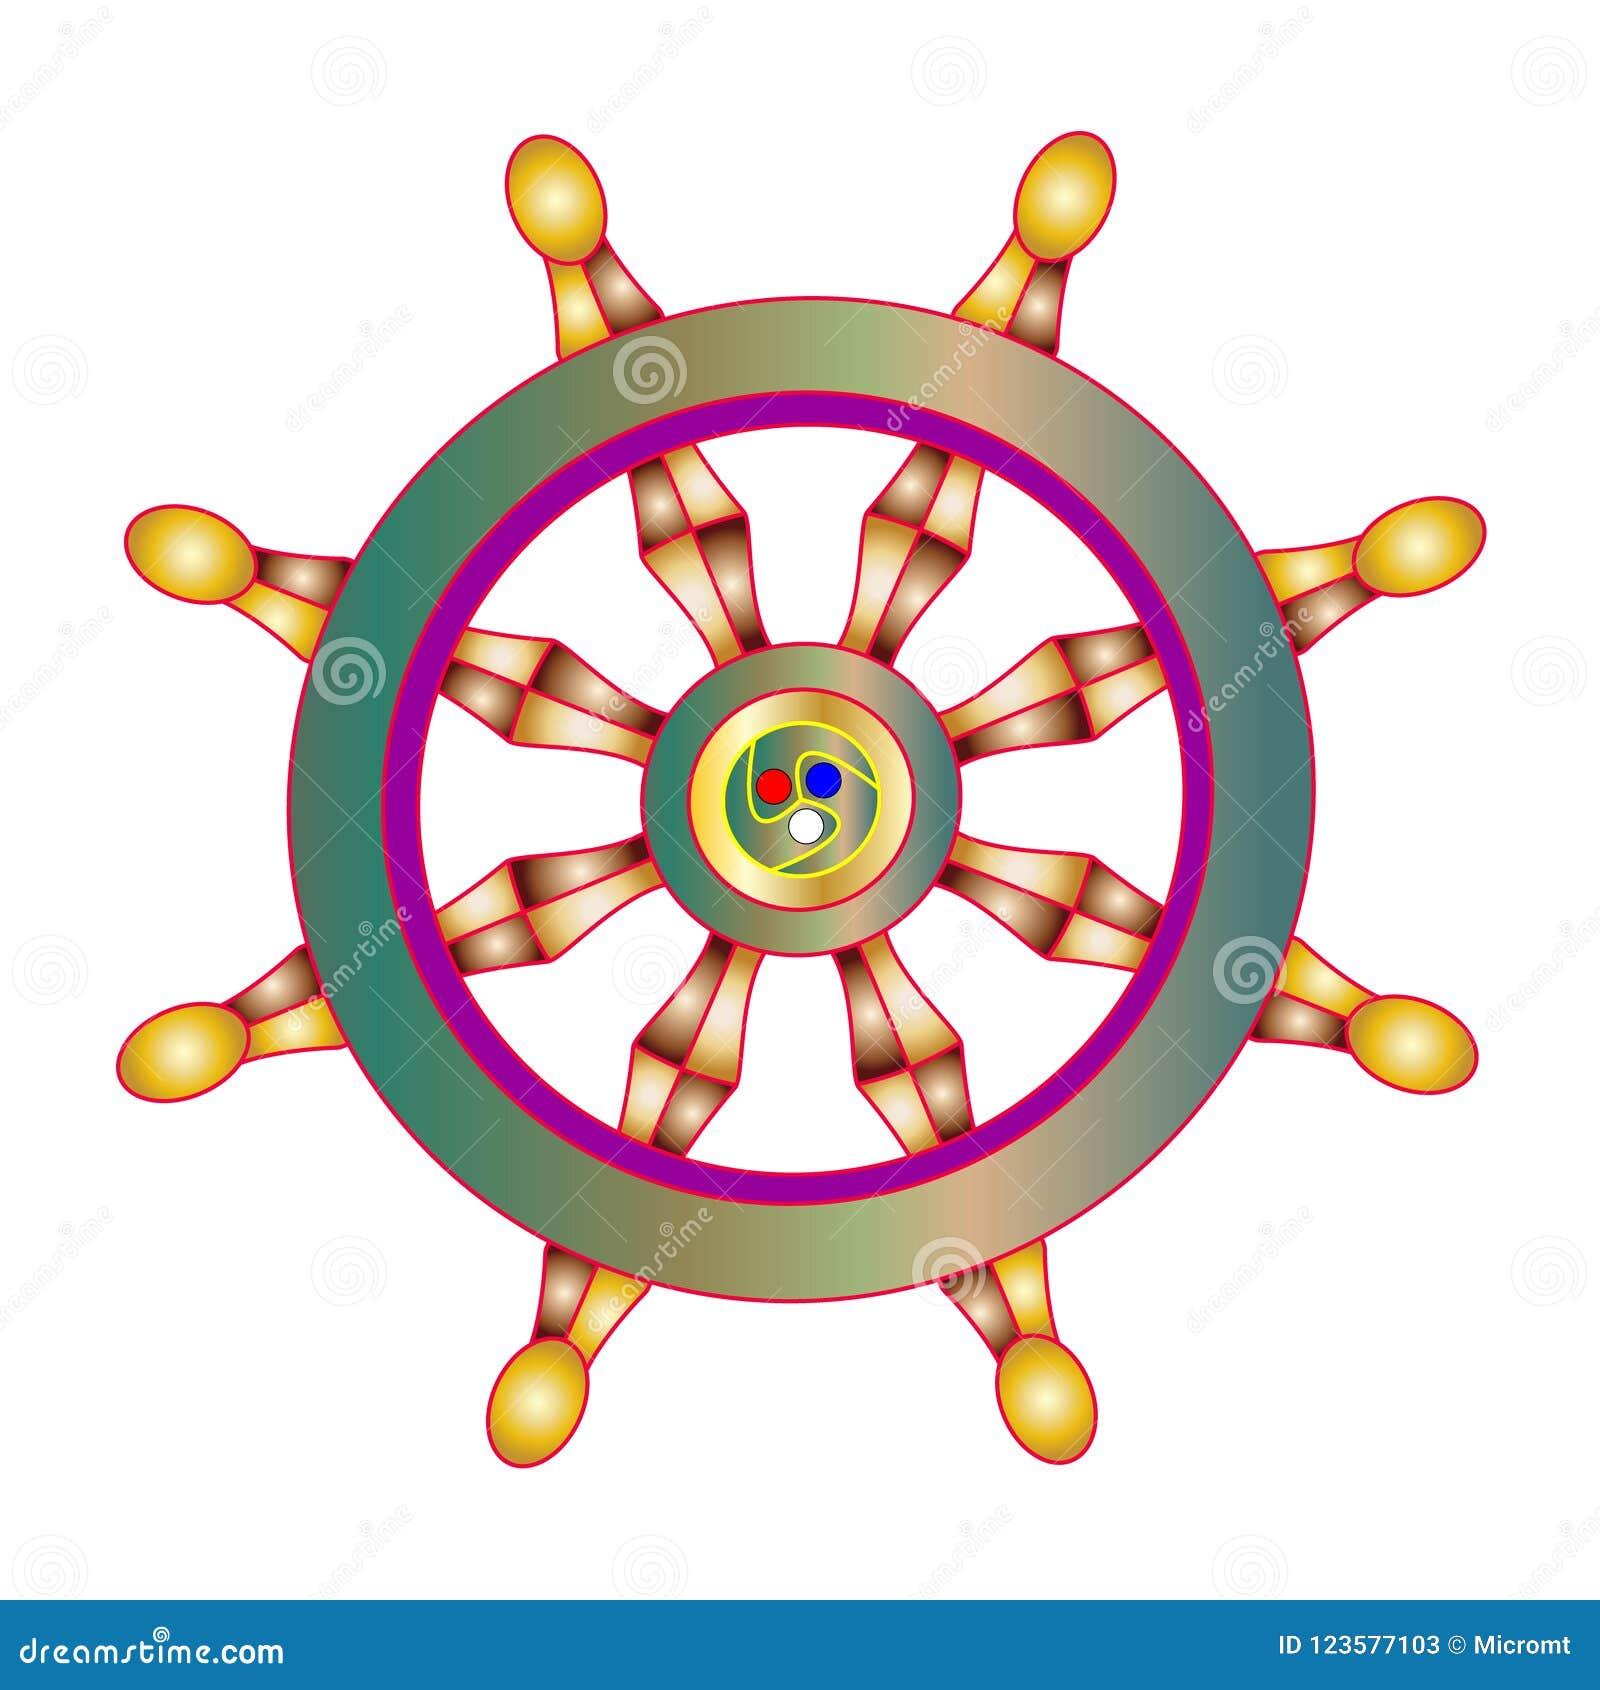 Vector Illustration Golden Dharma Wheel Buddhism Symbol